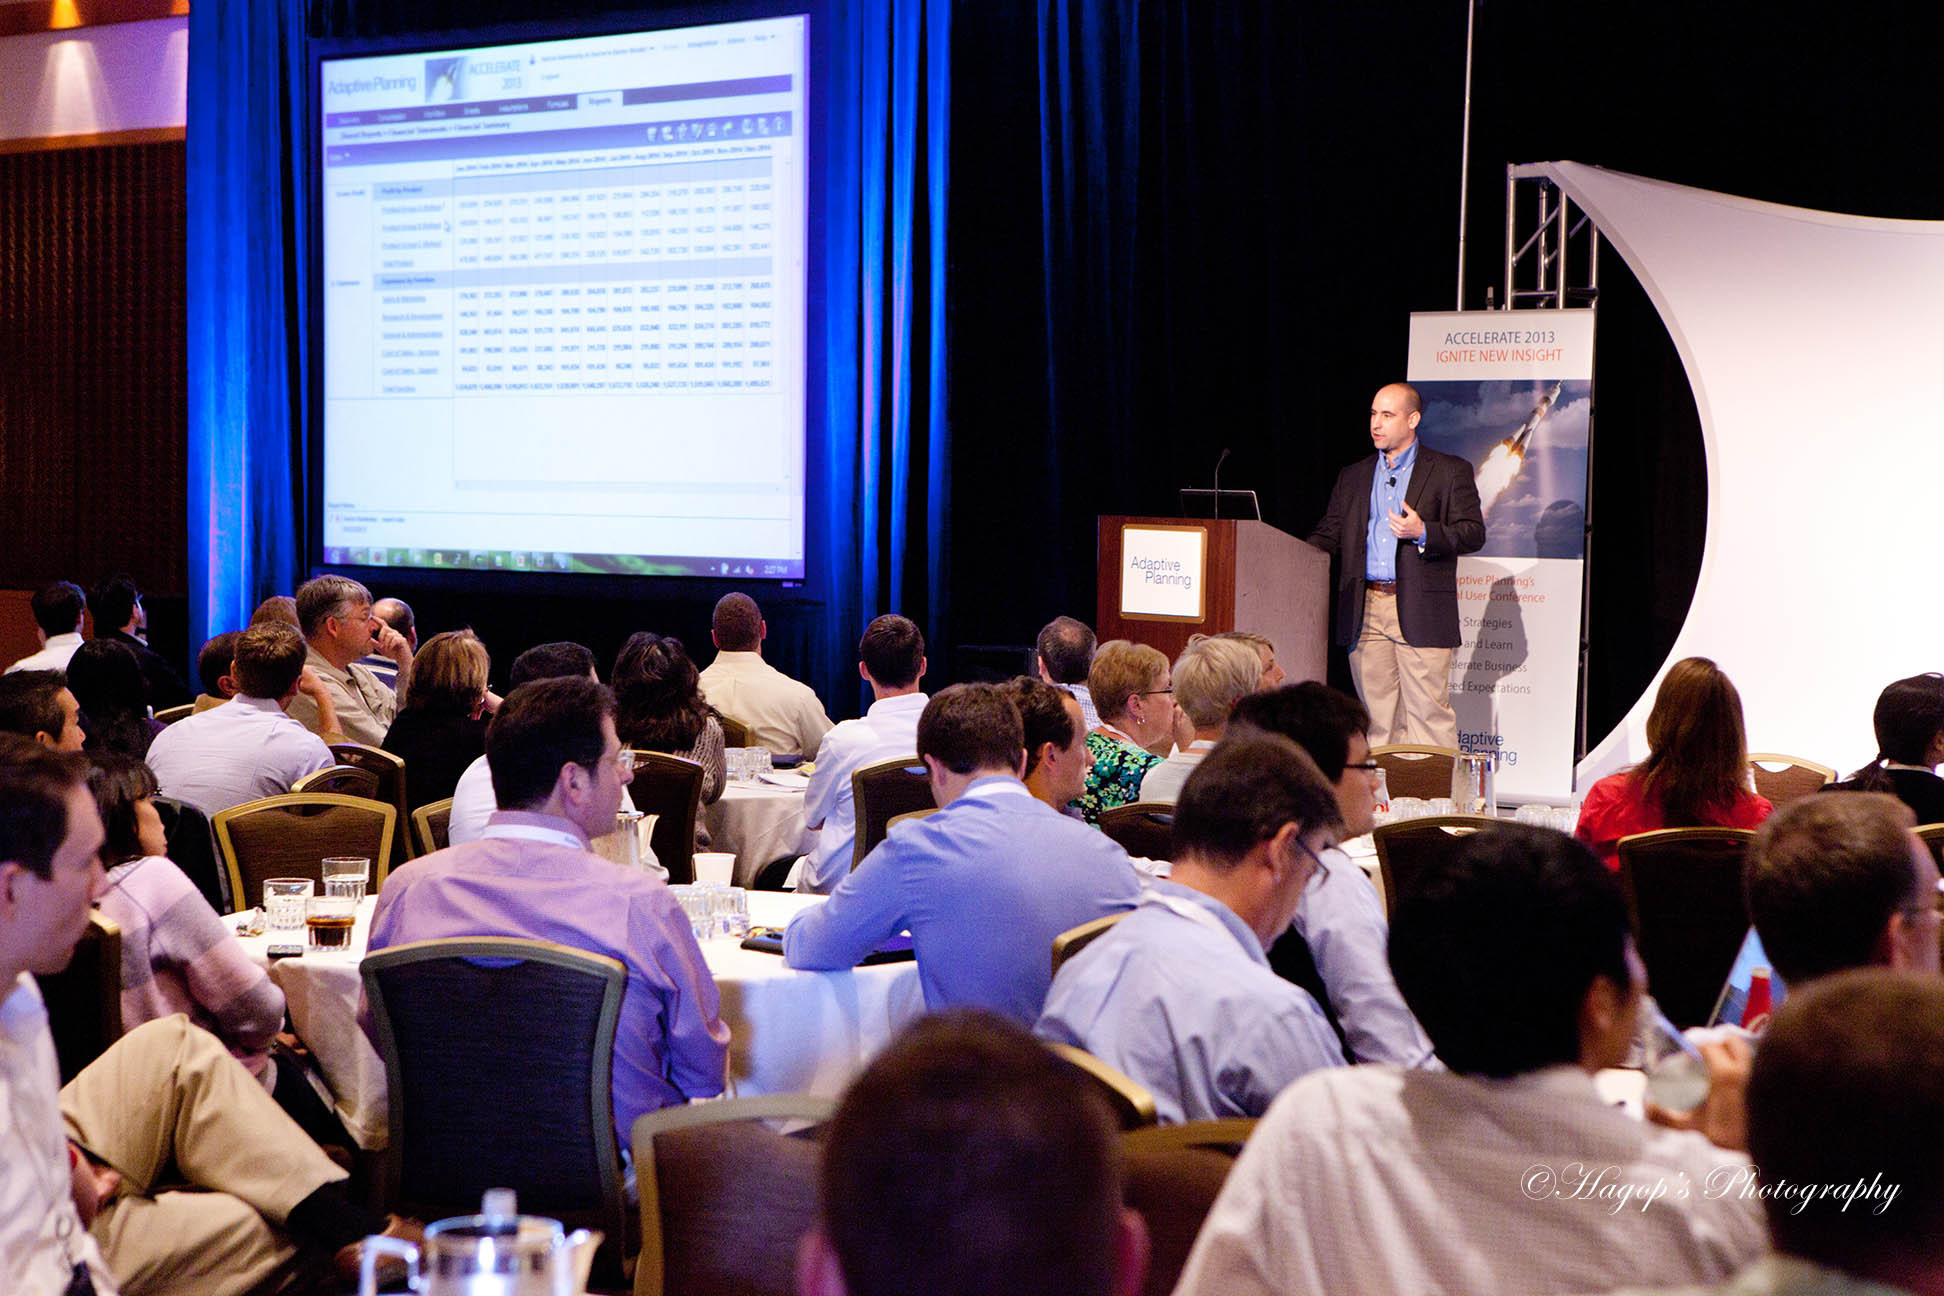 speaker photo during his presentation